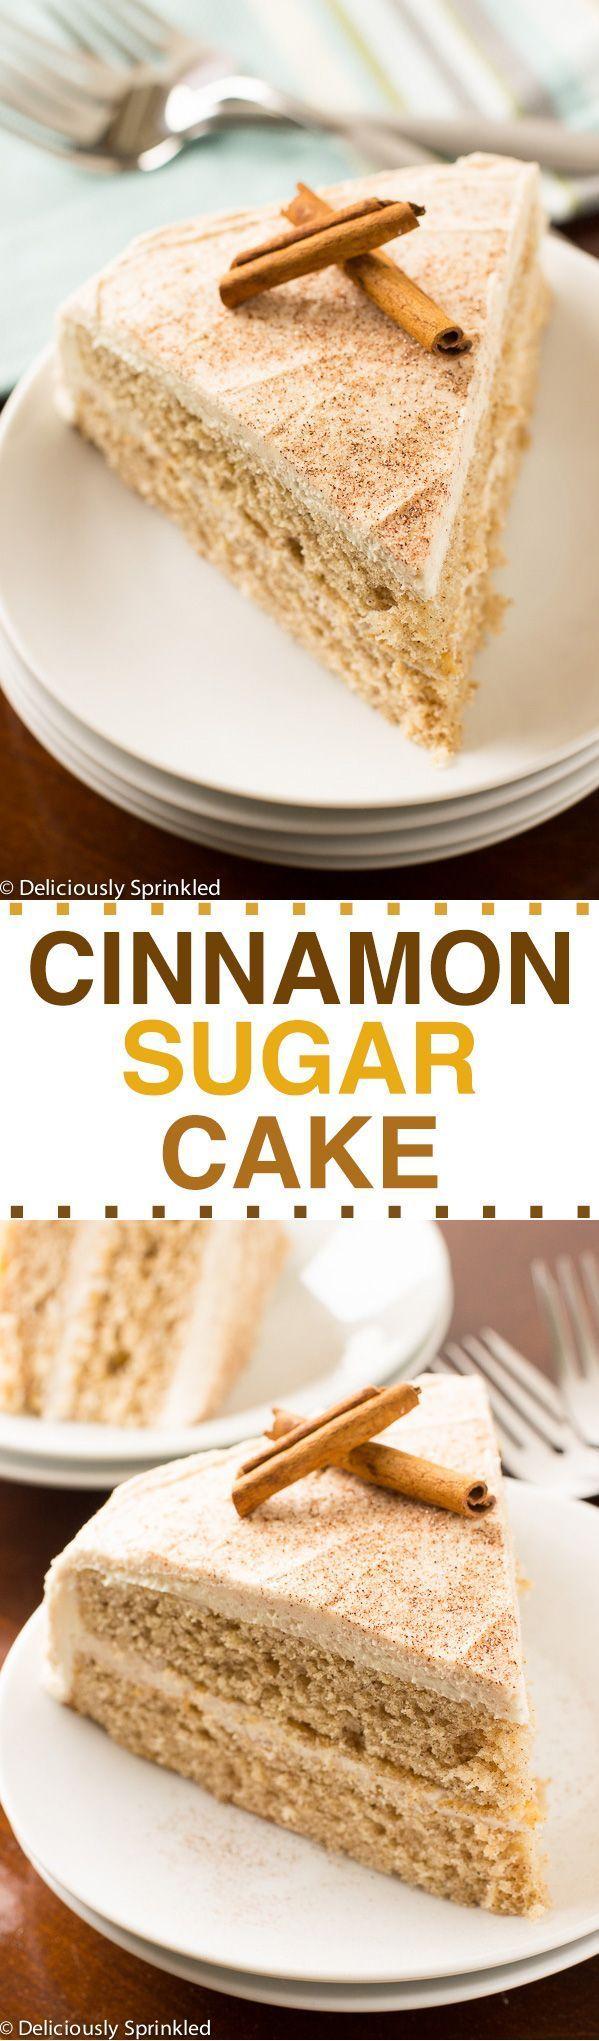 Cinnamon-Sugar Cake Recipe  Thanksgiving Desserts, Christmas Desserts, Cake Recipes, Holiday Desserts, Easy Dessert Recipes, Cinnamon, Buttercream Frosting Recipes